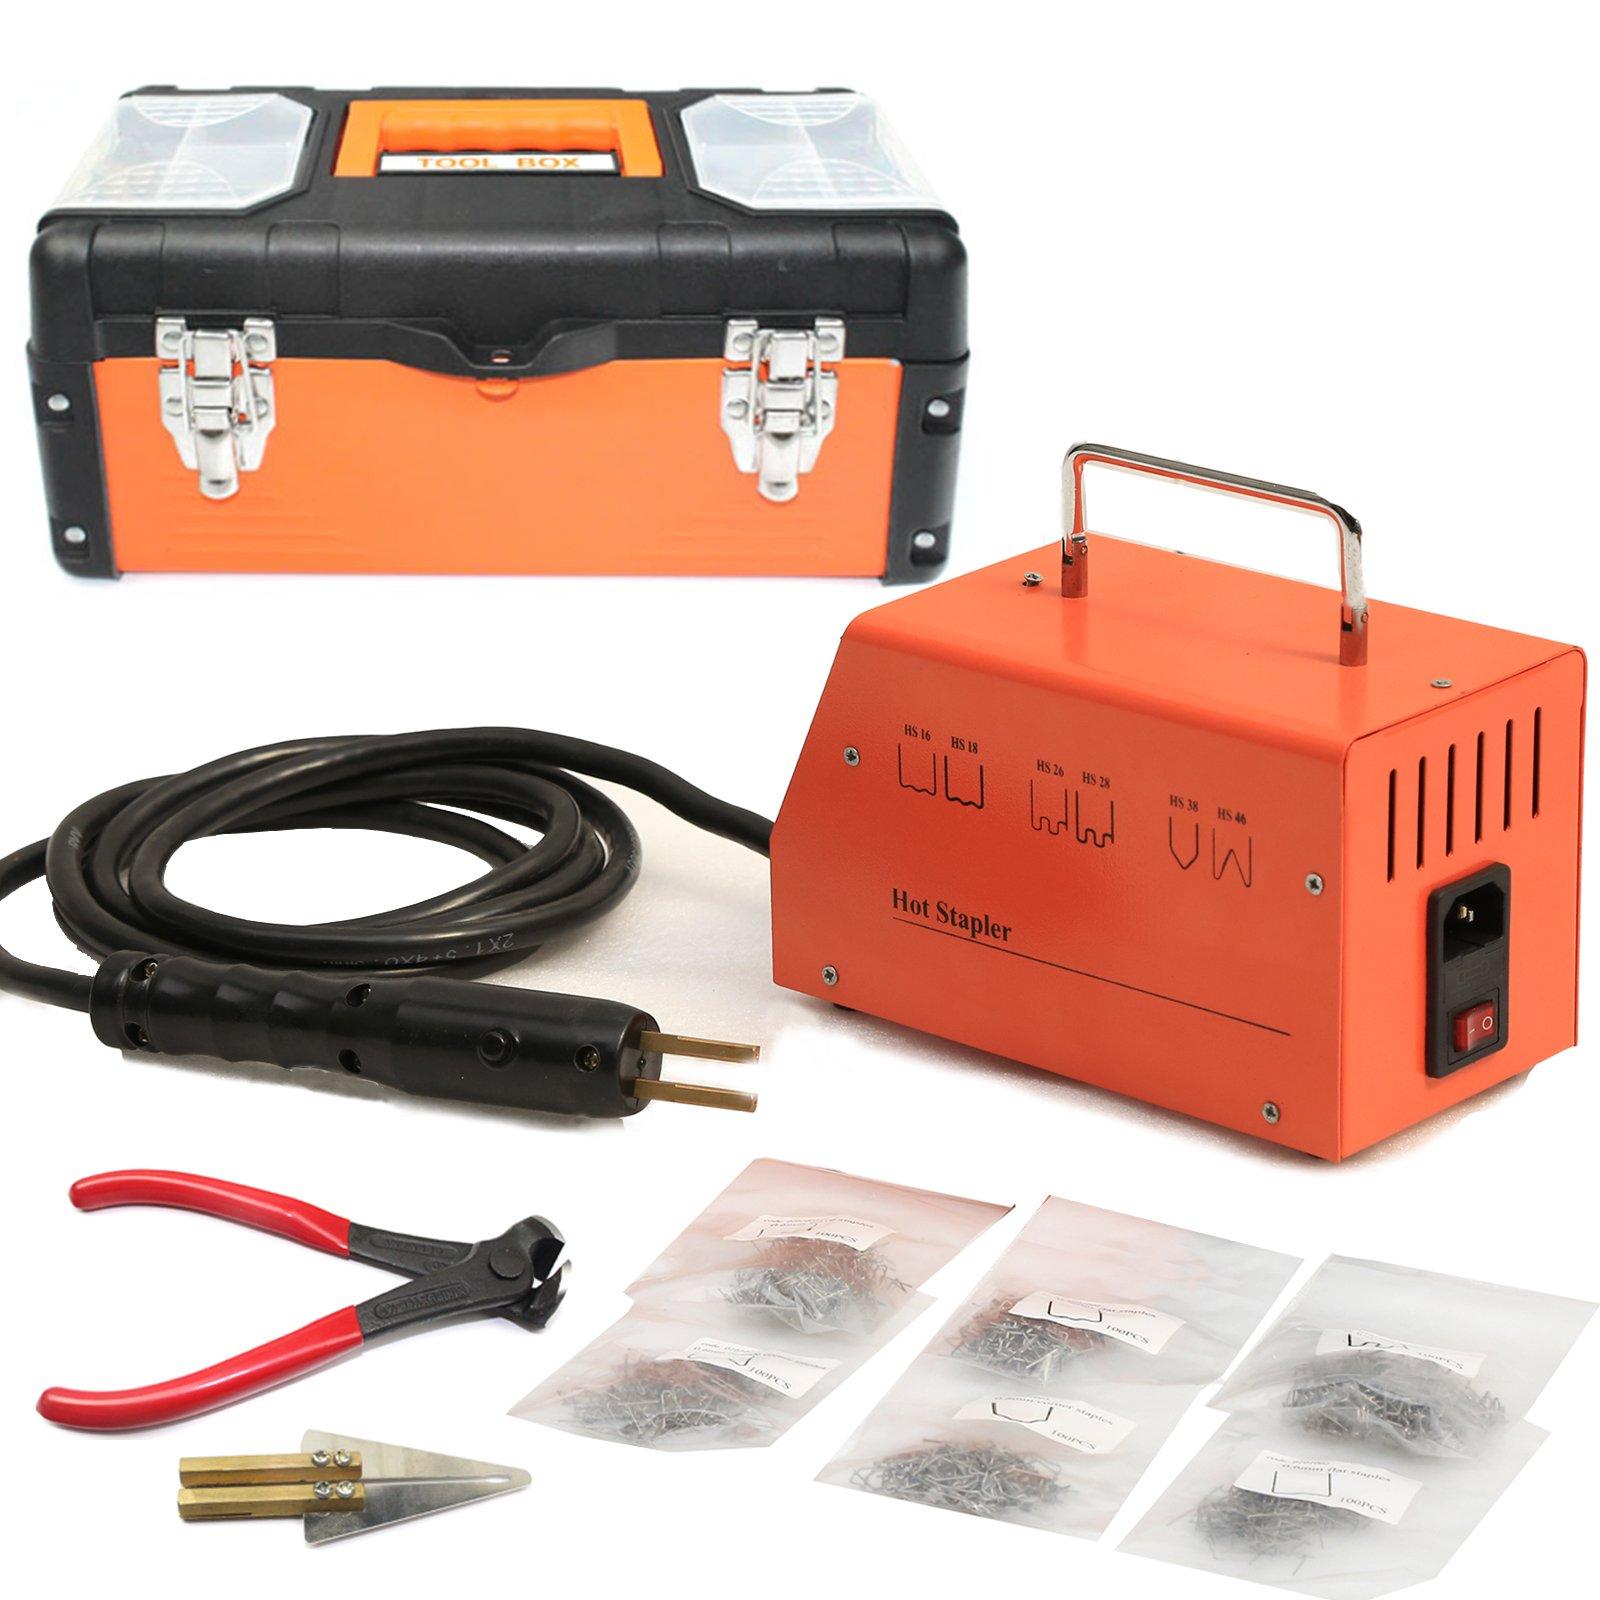 BELEY Car Bumper Repair Plastic Welder Kit, 110V Hot Stapler Plastic Welding Gun Machine with 600PCS Staples